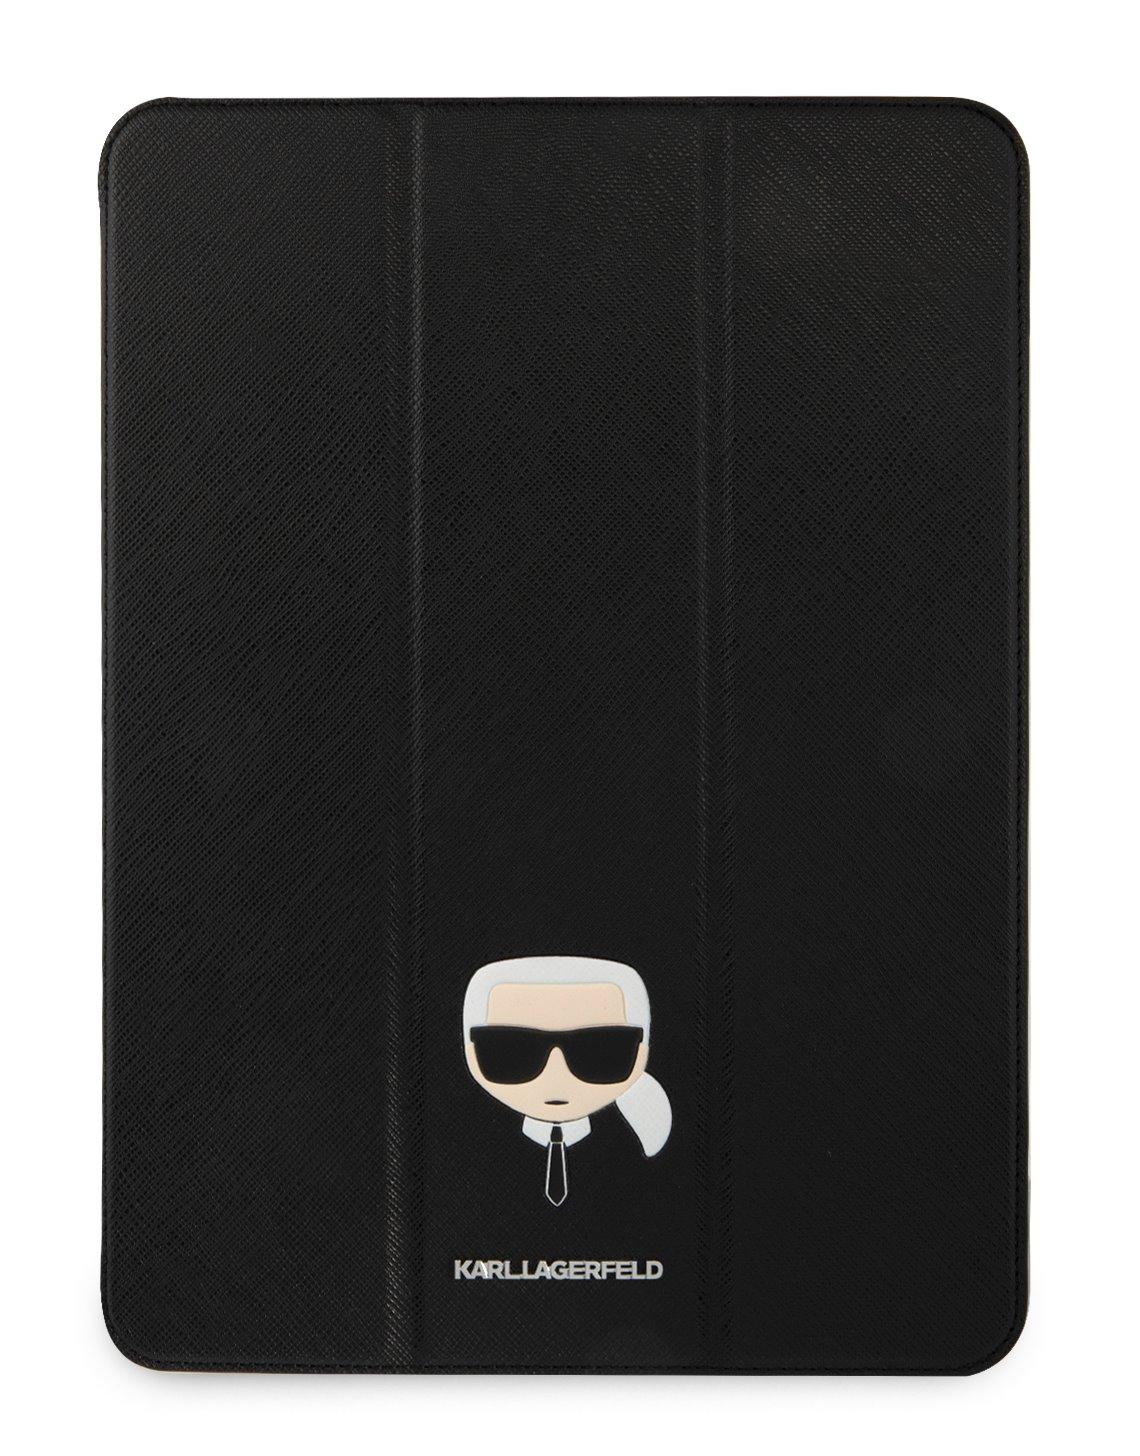 Pouzdro na tablet Karl Lagerfeld Head Saffiano KLFC12OKHK pro Apple iPad Pro 12.9, černá